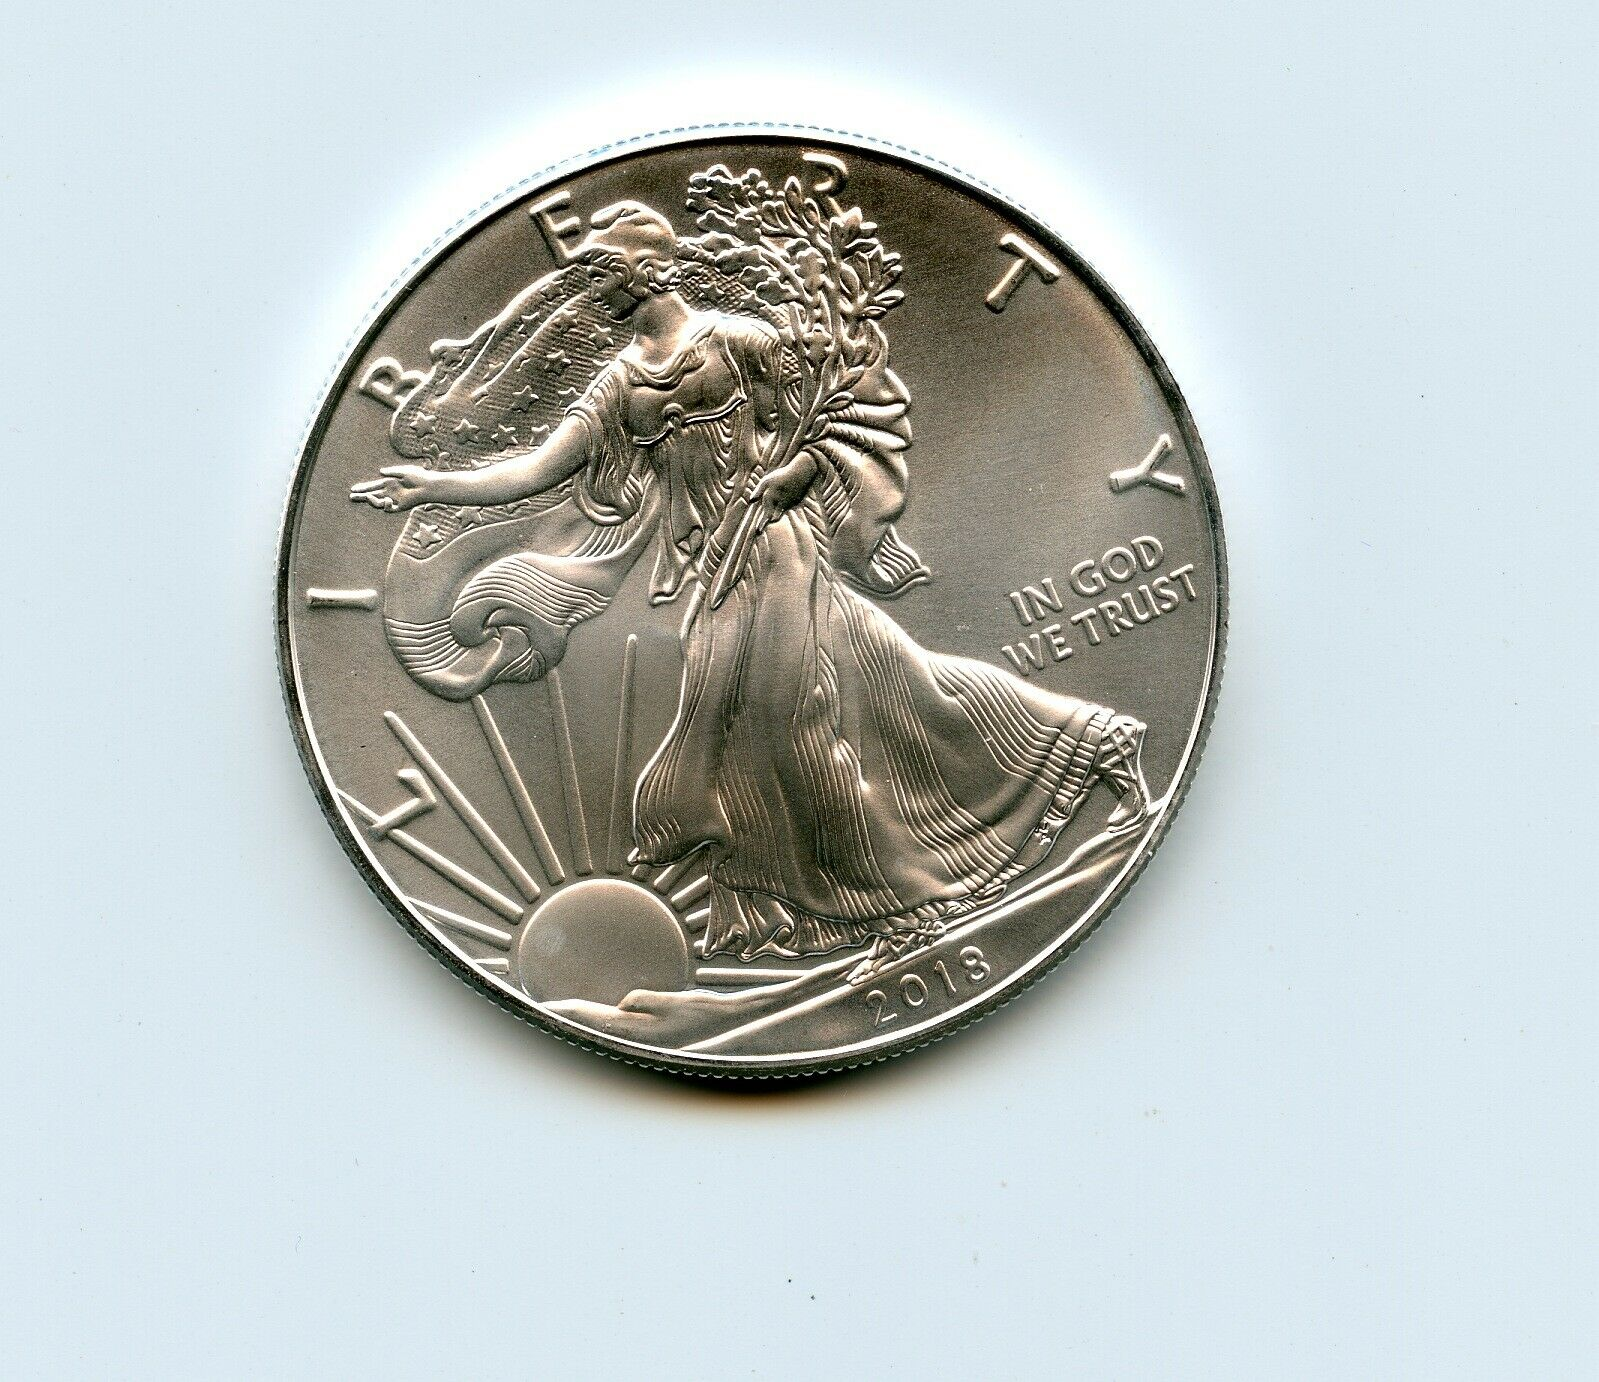 2018 United States Silver Eagle Unc - $35.50